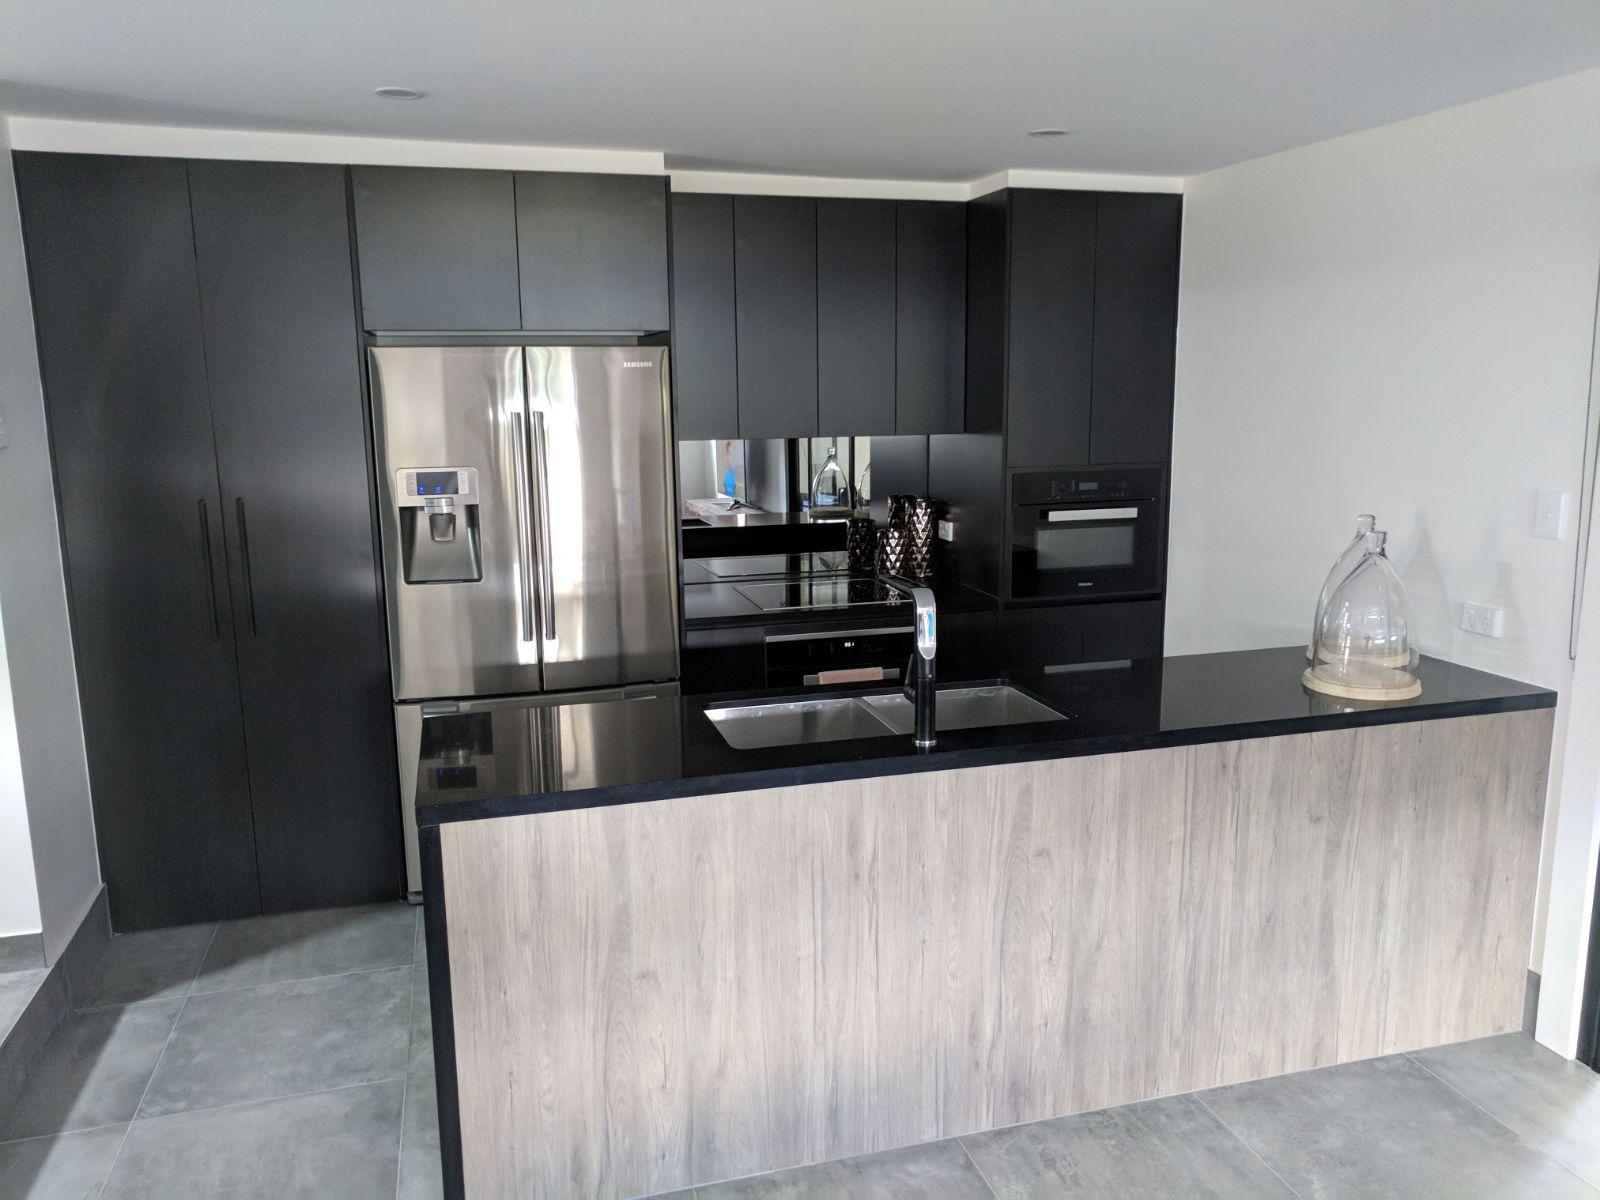 Kitchen Renovations Sydney Creative Joinery & Kitchens